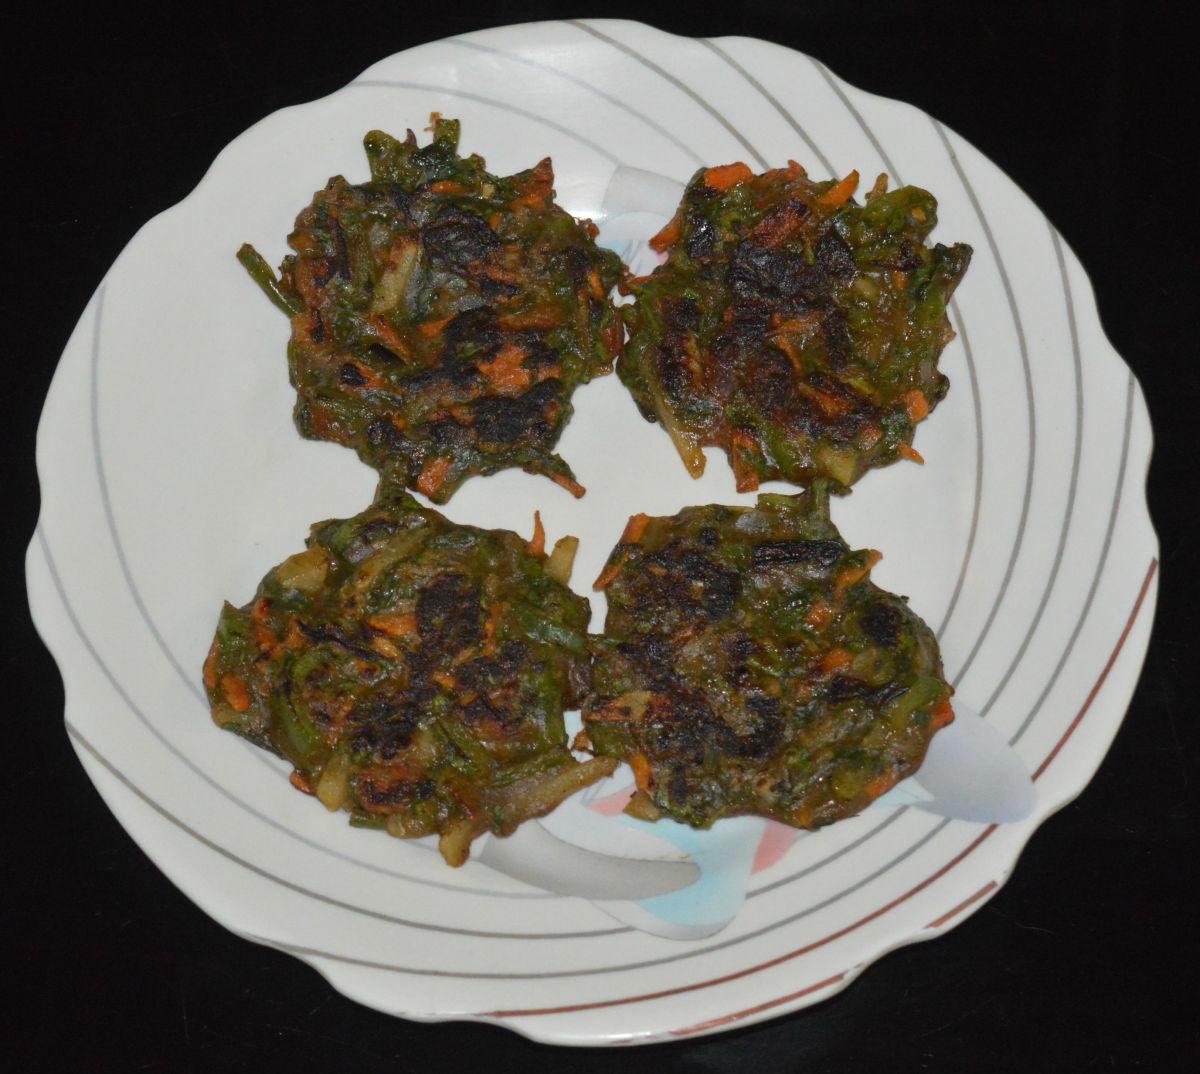 Mixed vegetable mini pancakes (besan cheela) are delicious!